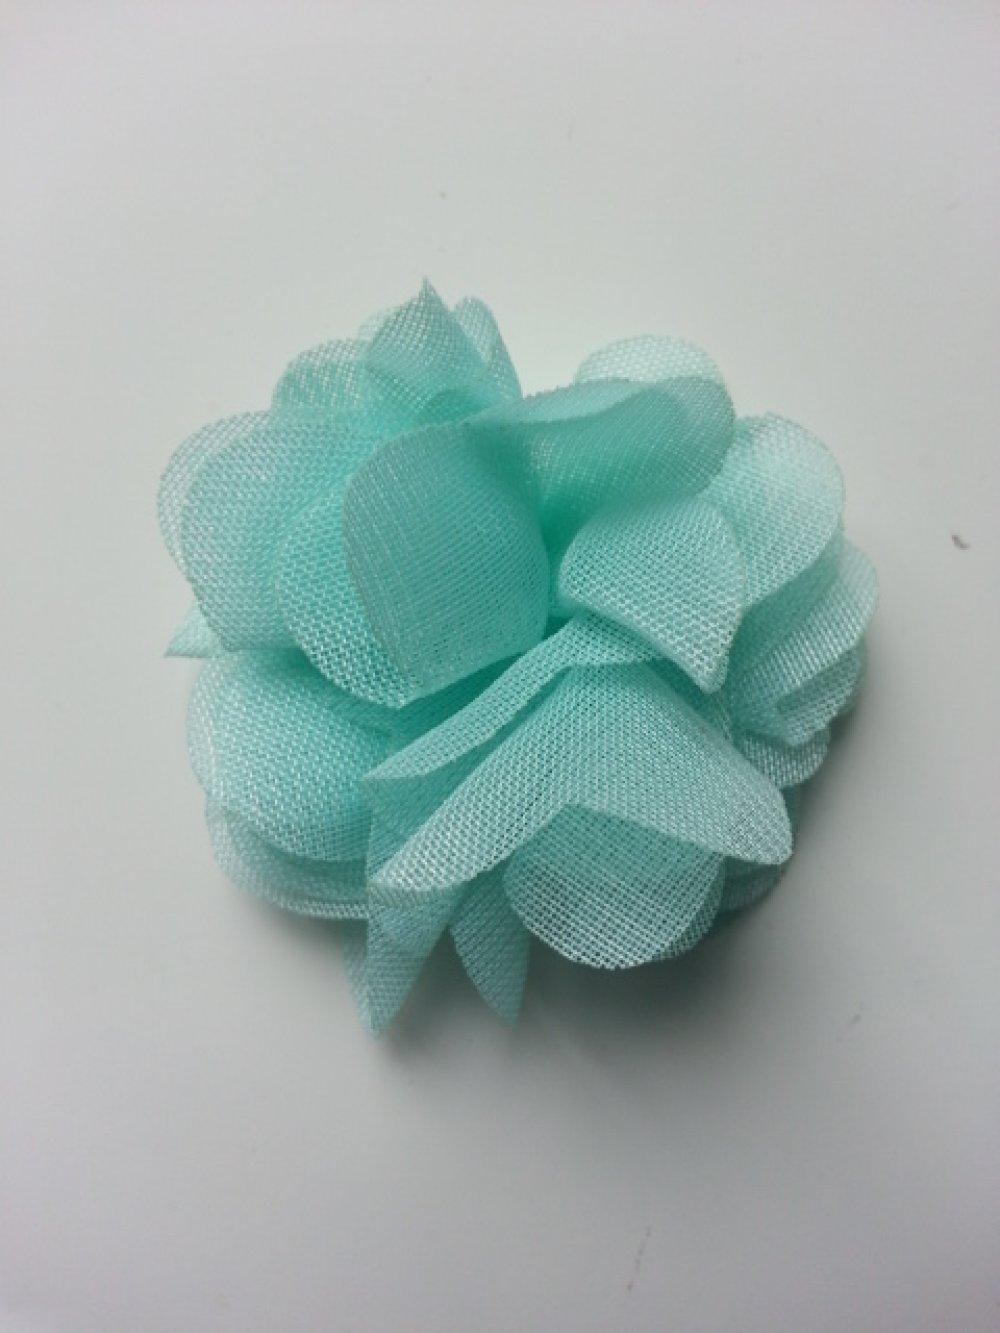 2652834 petite fleur en tissu blanc 4cm 1